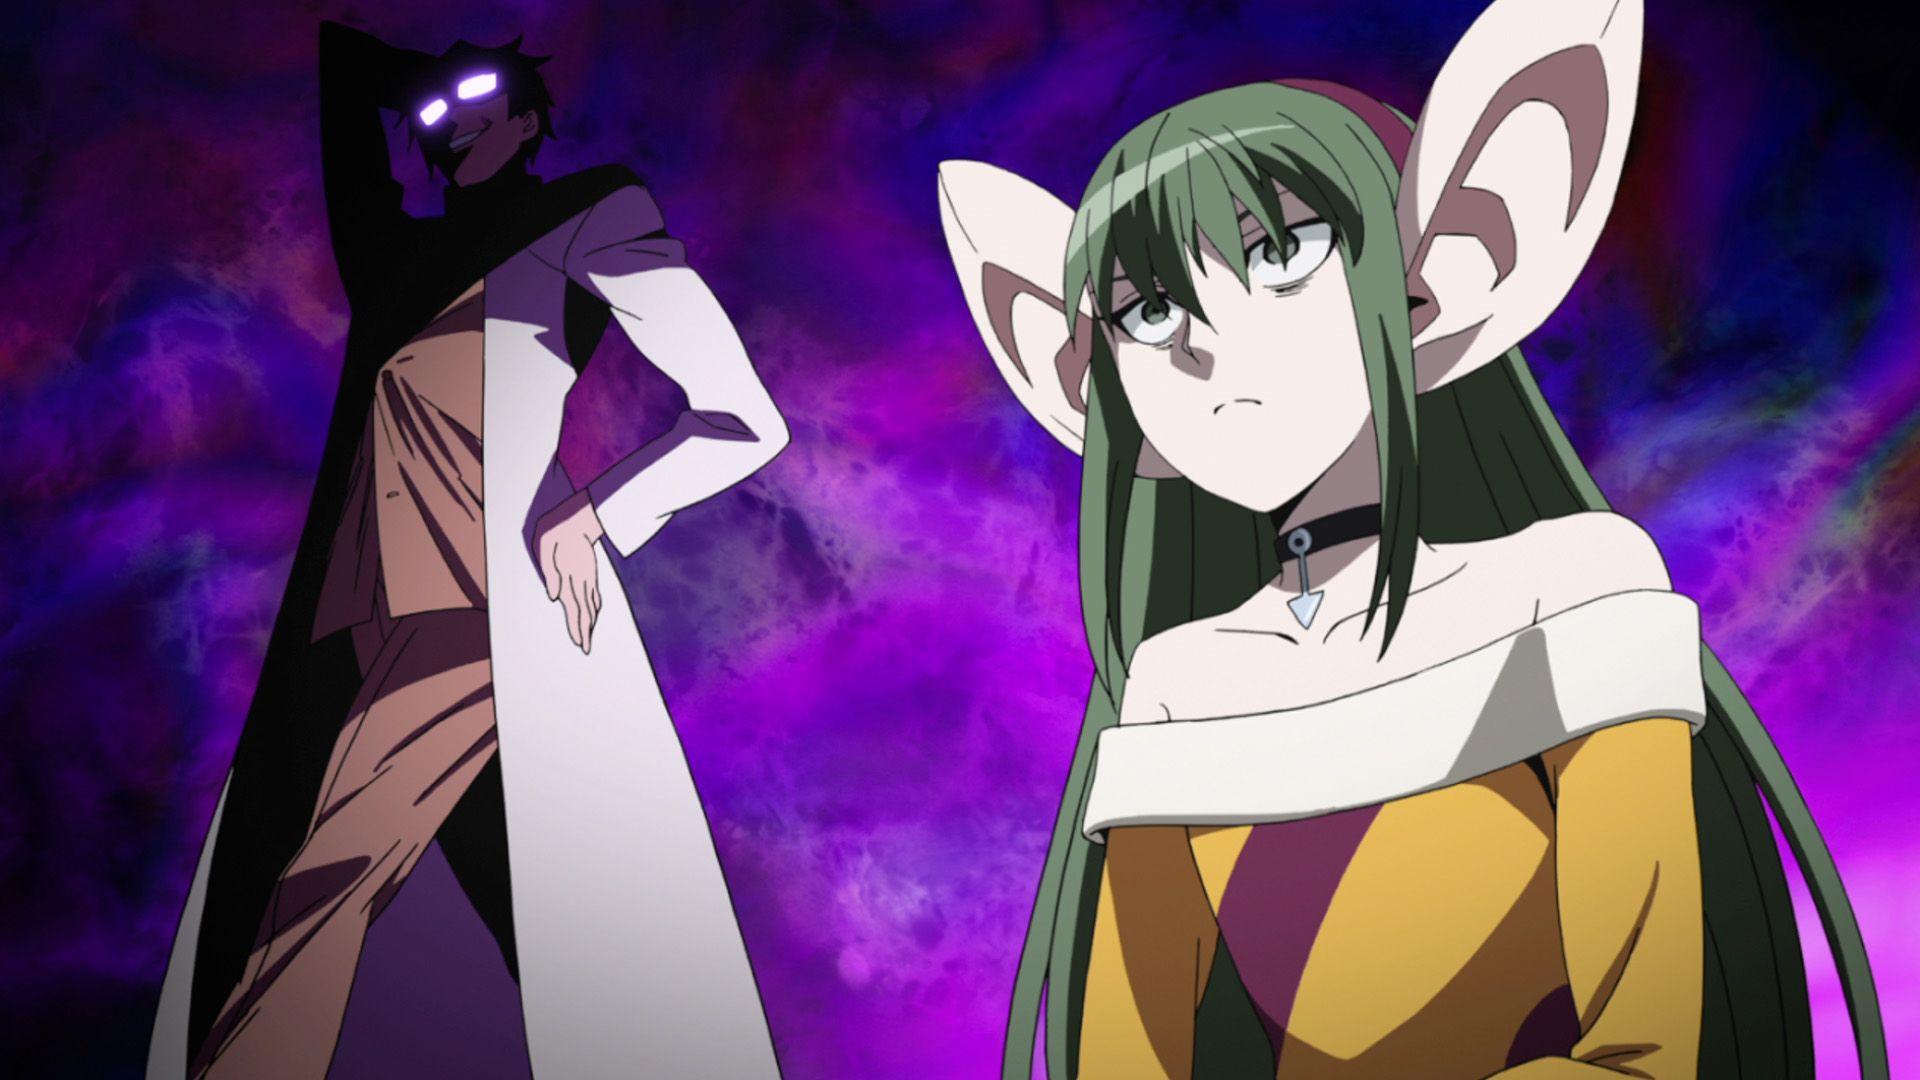 Red Eyes Sword - Akame ga KILL! - Épisode 11 : Mort au savant fou